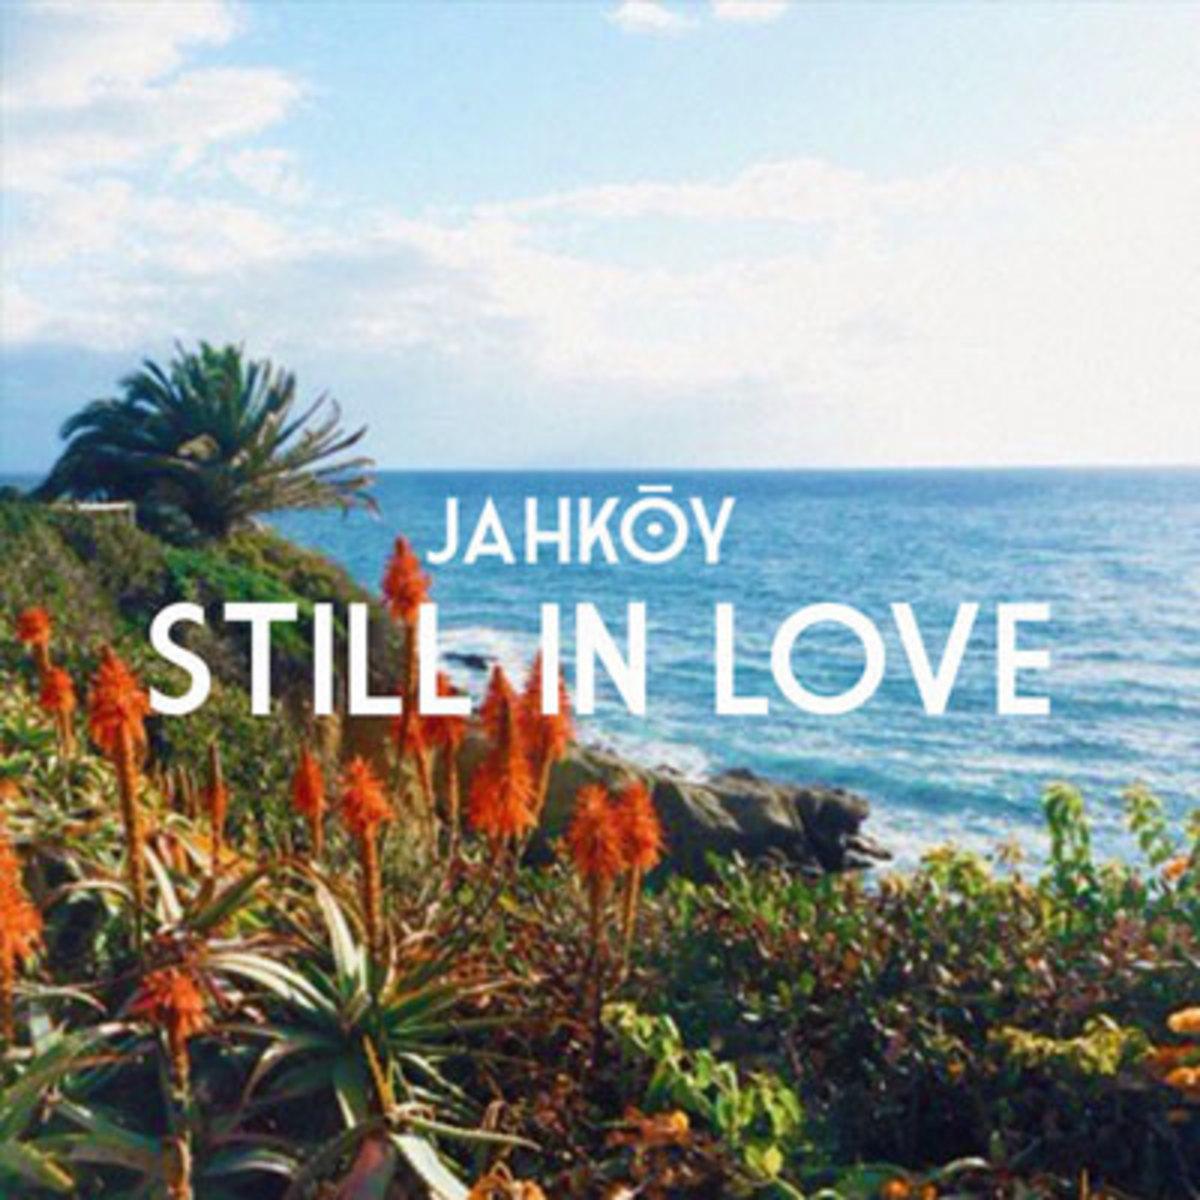 jahkoy-still-in-love.jpg